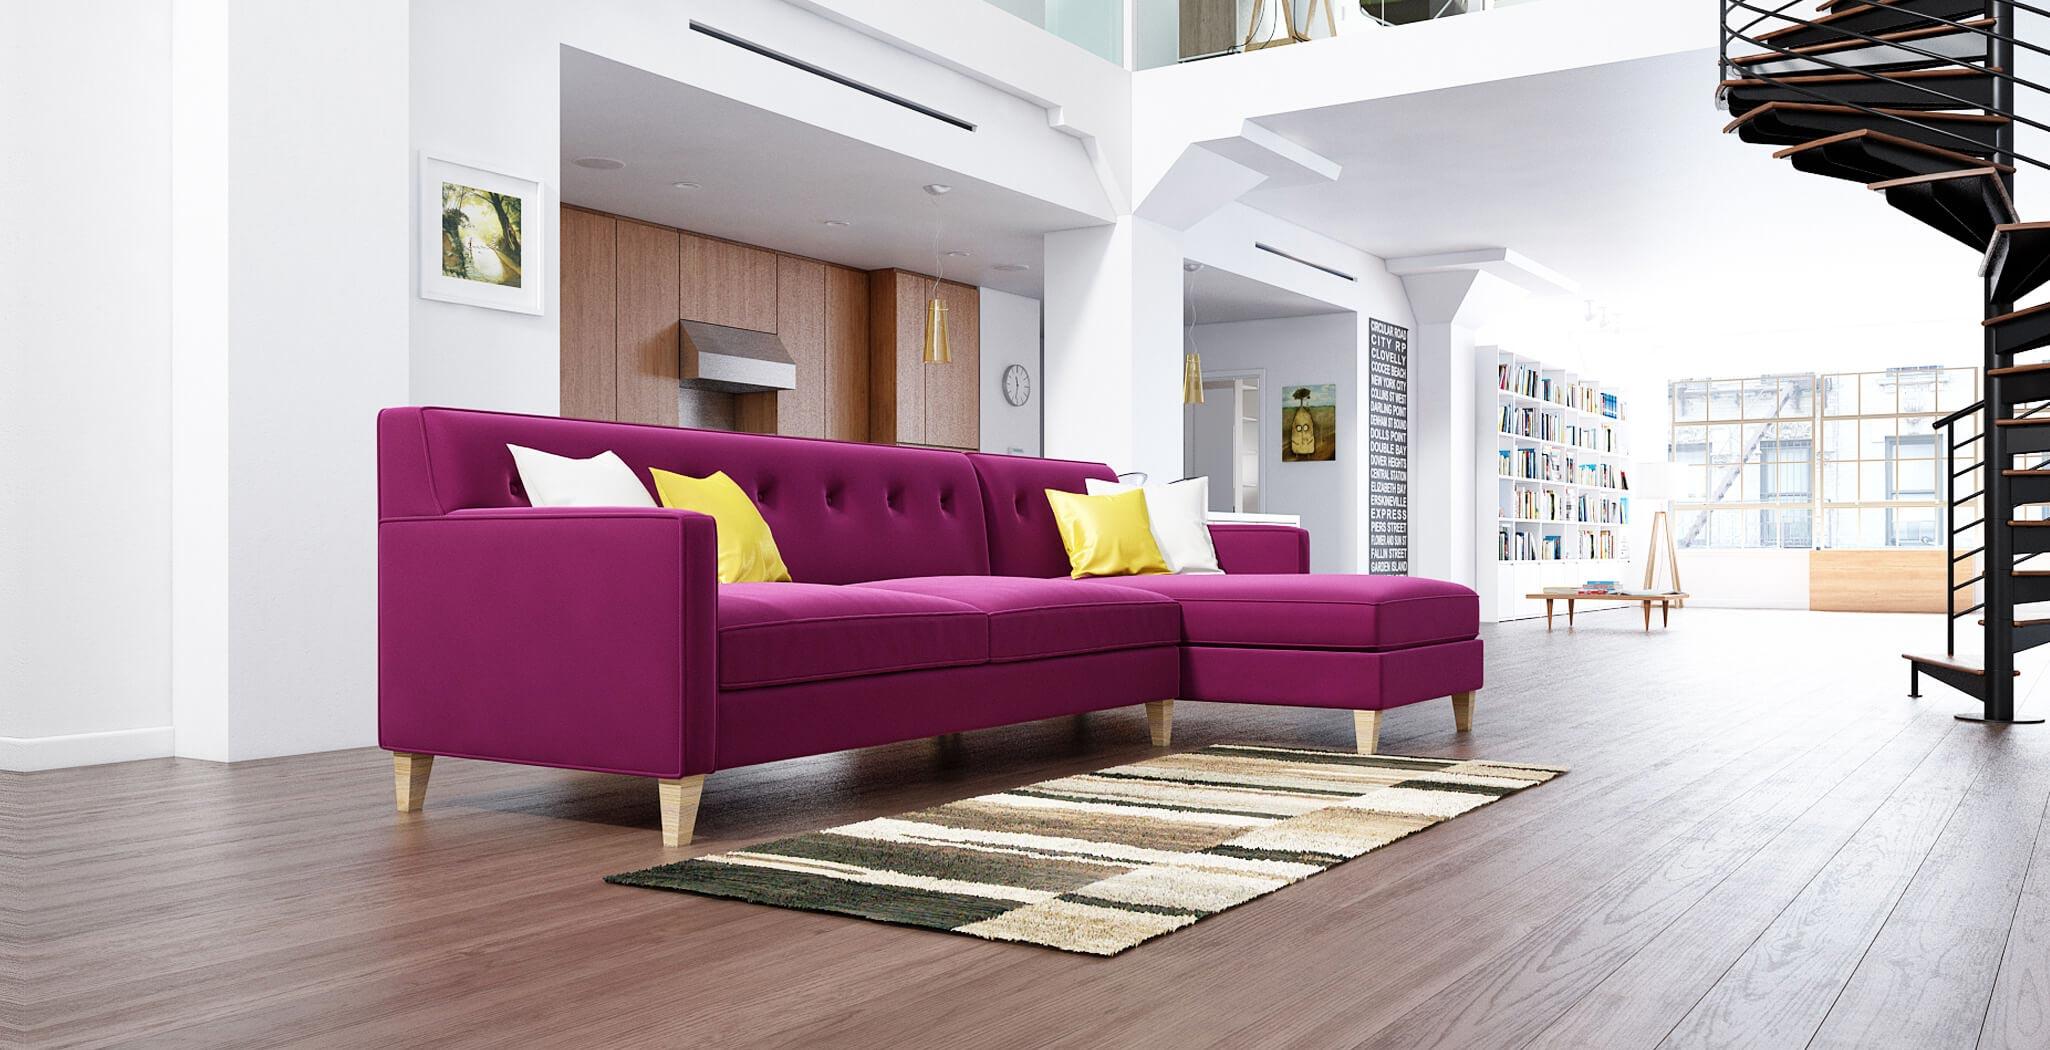 harper panel furniture gallery 3